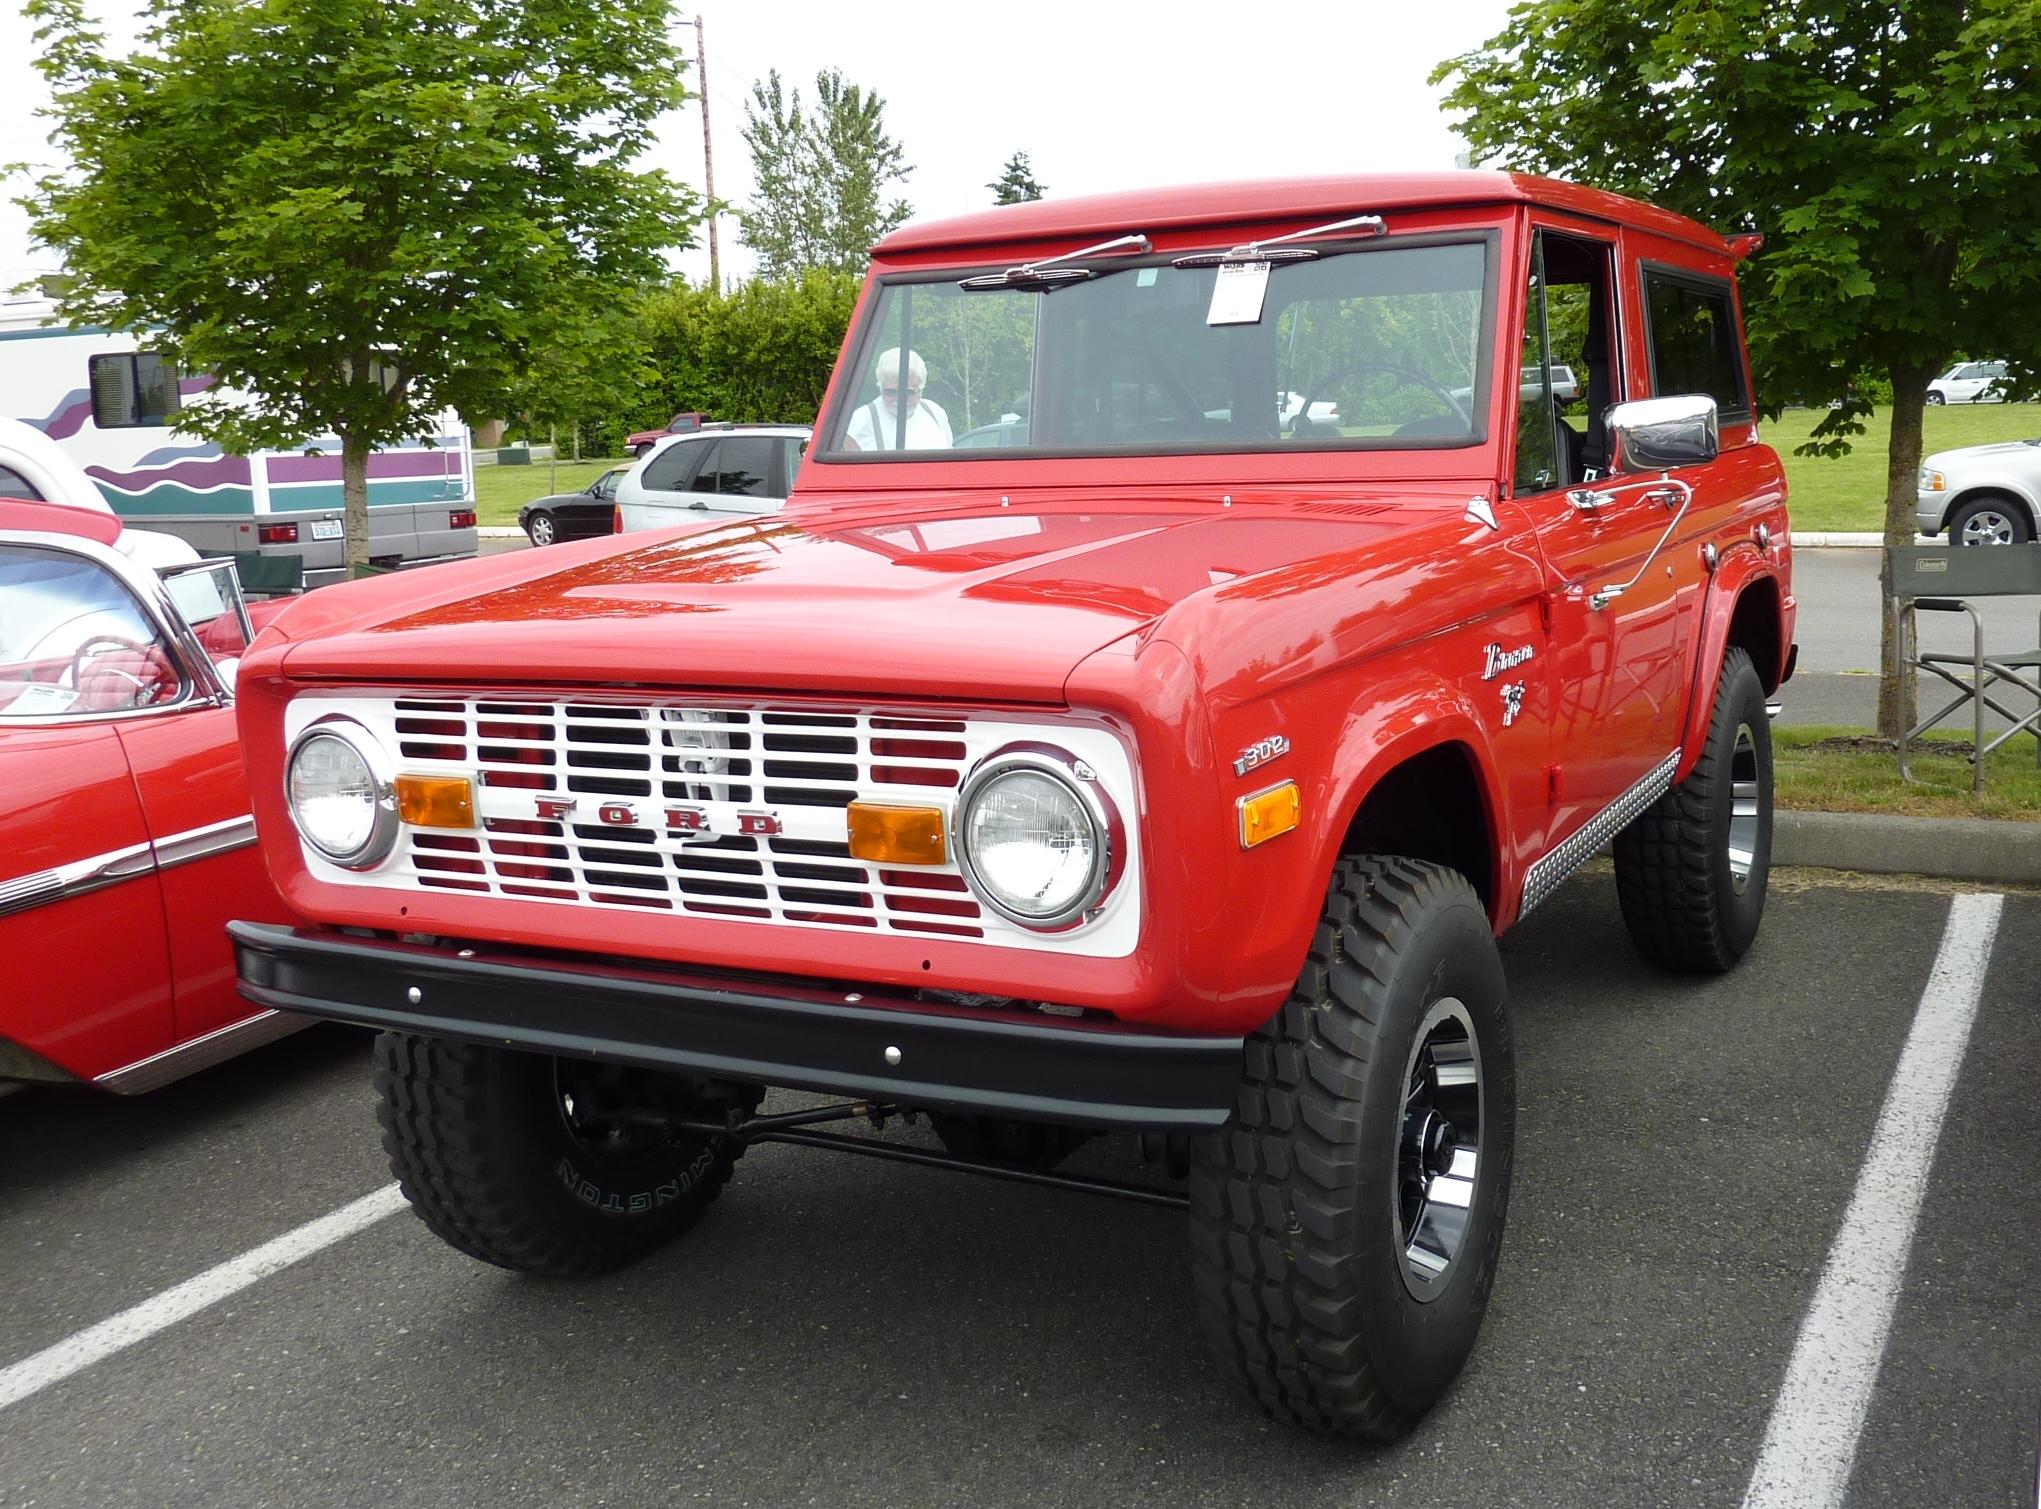 1971 Ford Bronco Interior 1971 Ford Bronco 1920 x 1080